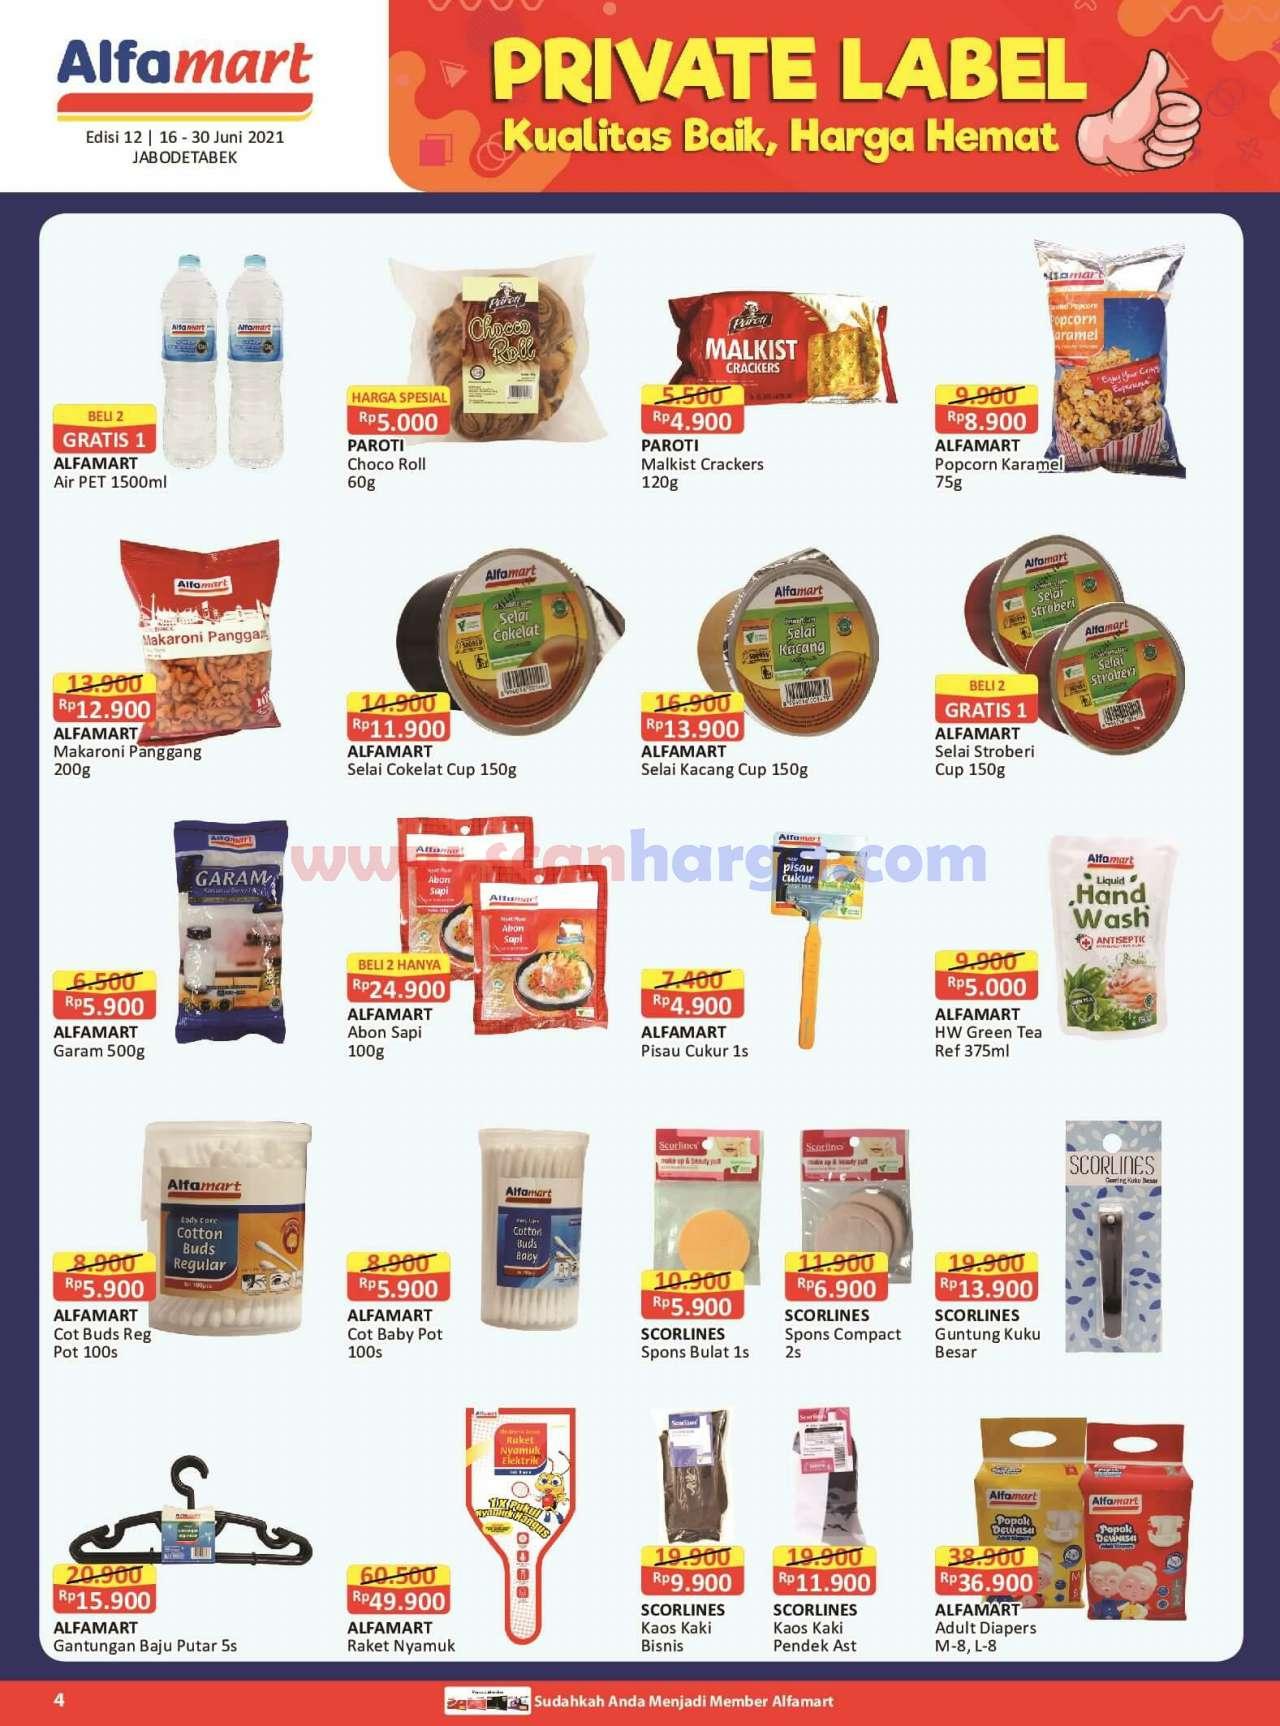 Katalog Promo Alfamart 16 - 30 Juni 2021 4